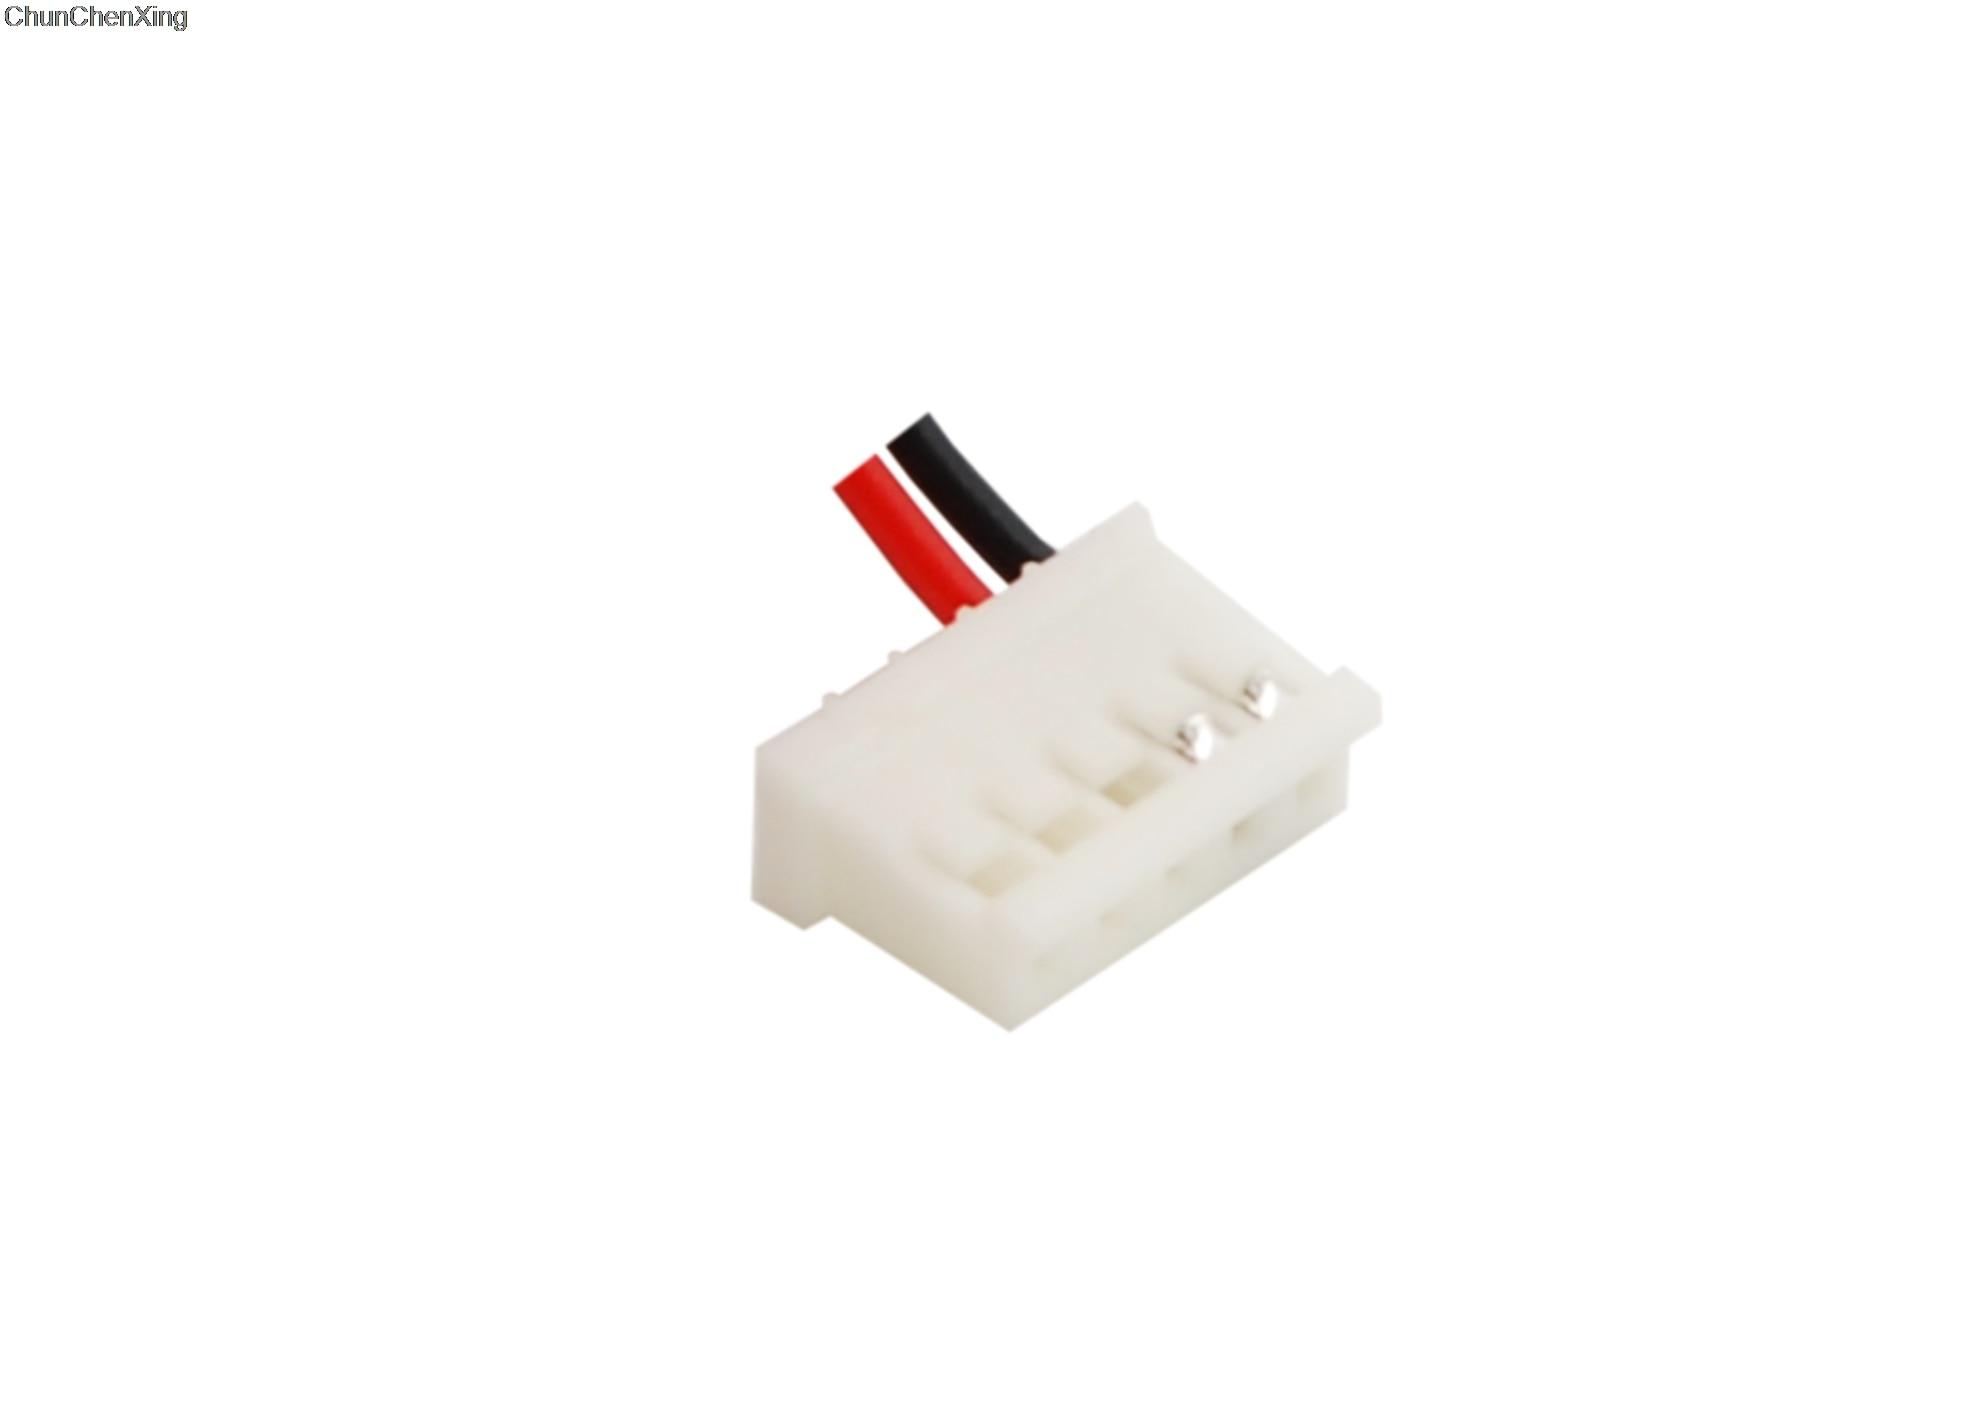 gWind Wireless Transducer Replacement Battery for Garmin 010-01248-00 361-00075-00 gWind Wireless Wind Sensor 010-12117-10